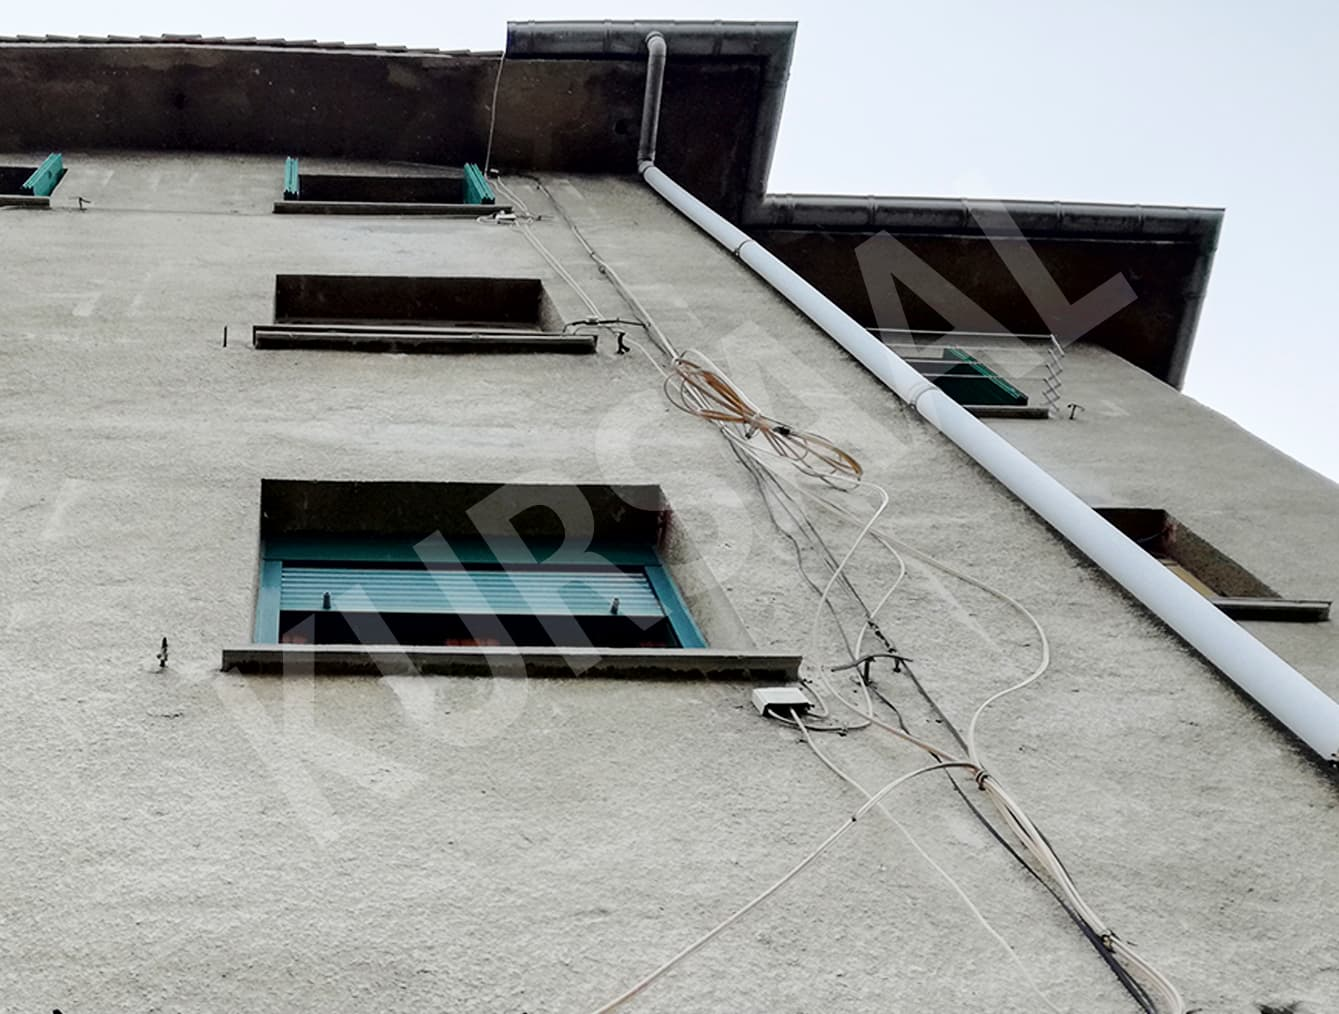 foto 3 - Aislamientos Térmicos y Eficiencia Energética-Prudencia Arbide 14-IRUN, GIPUZKOA